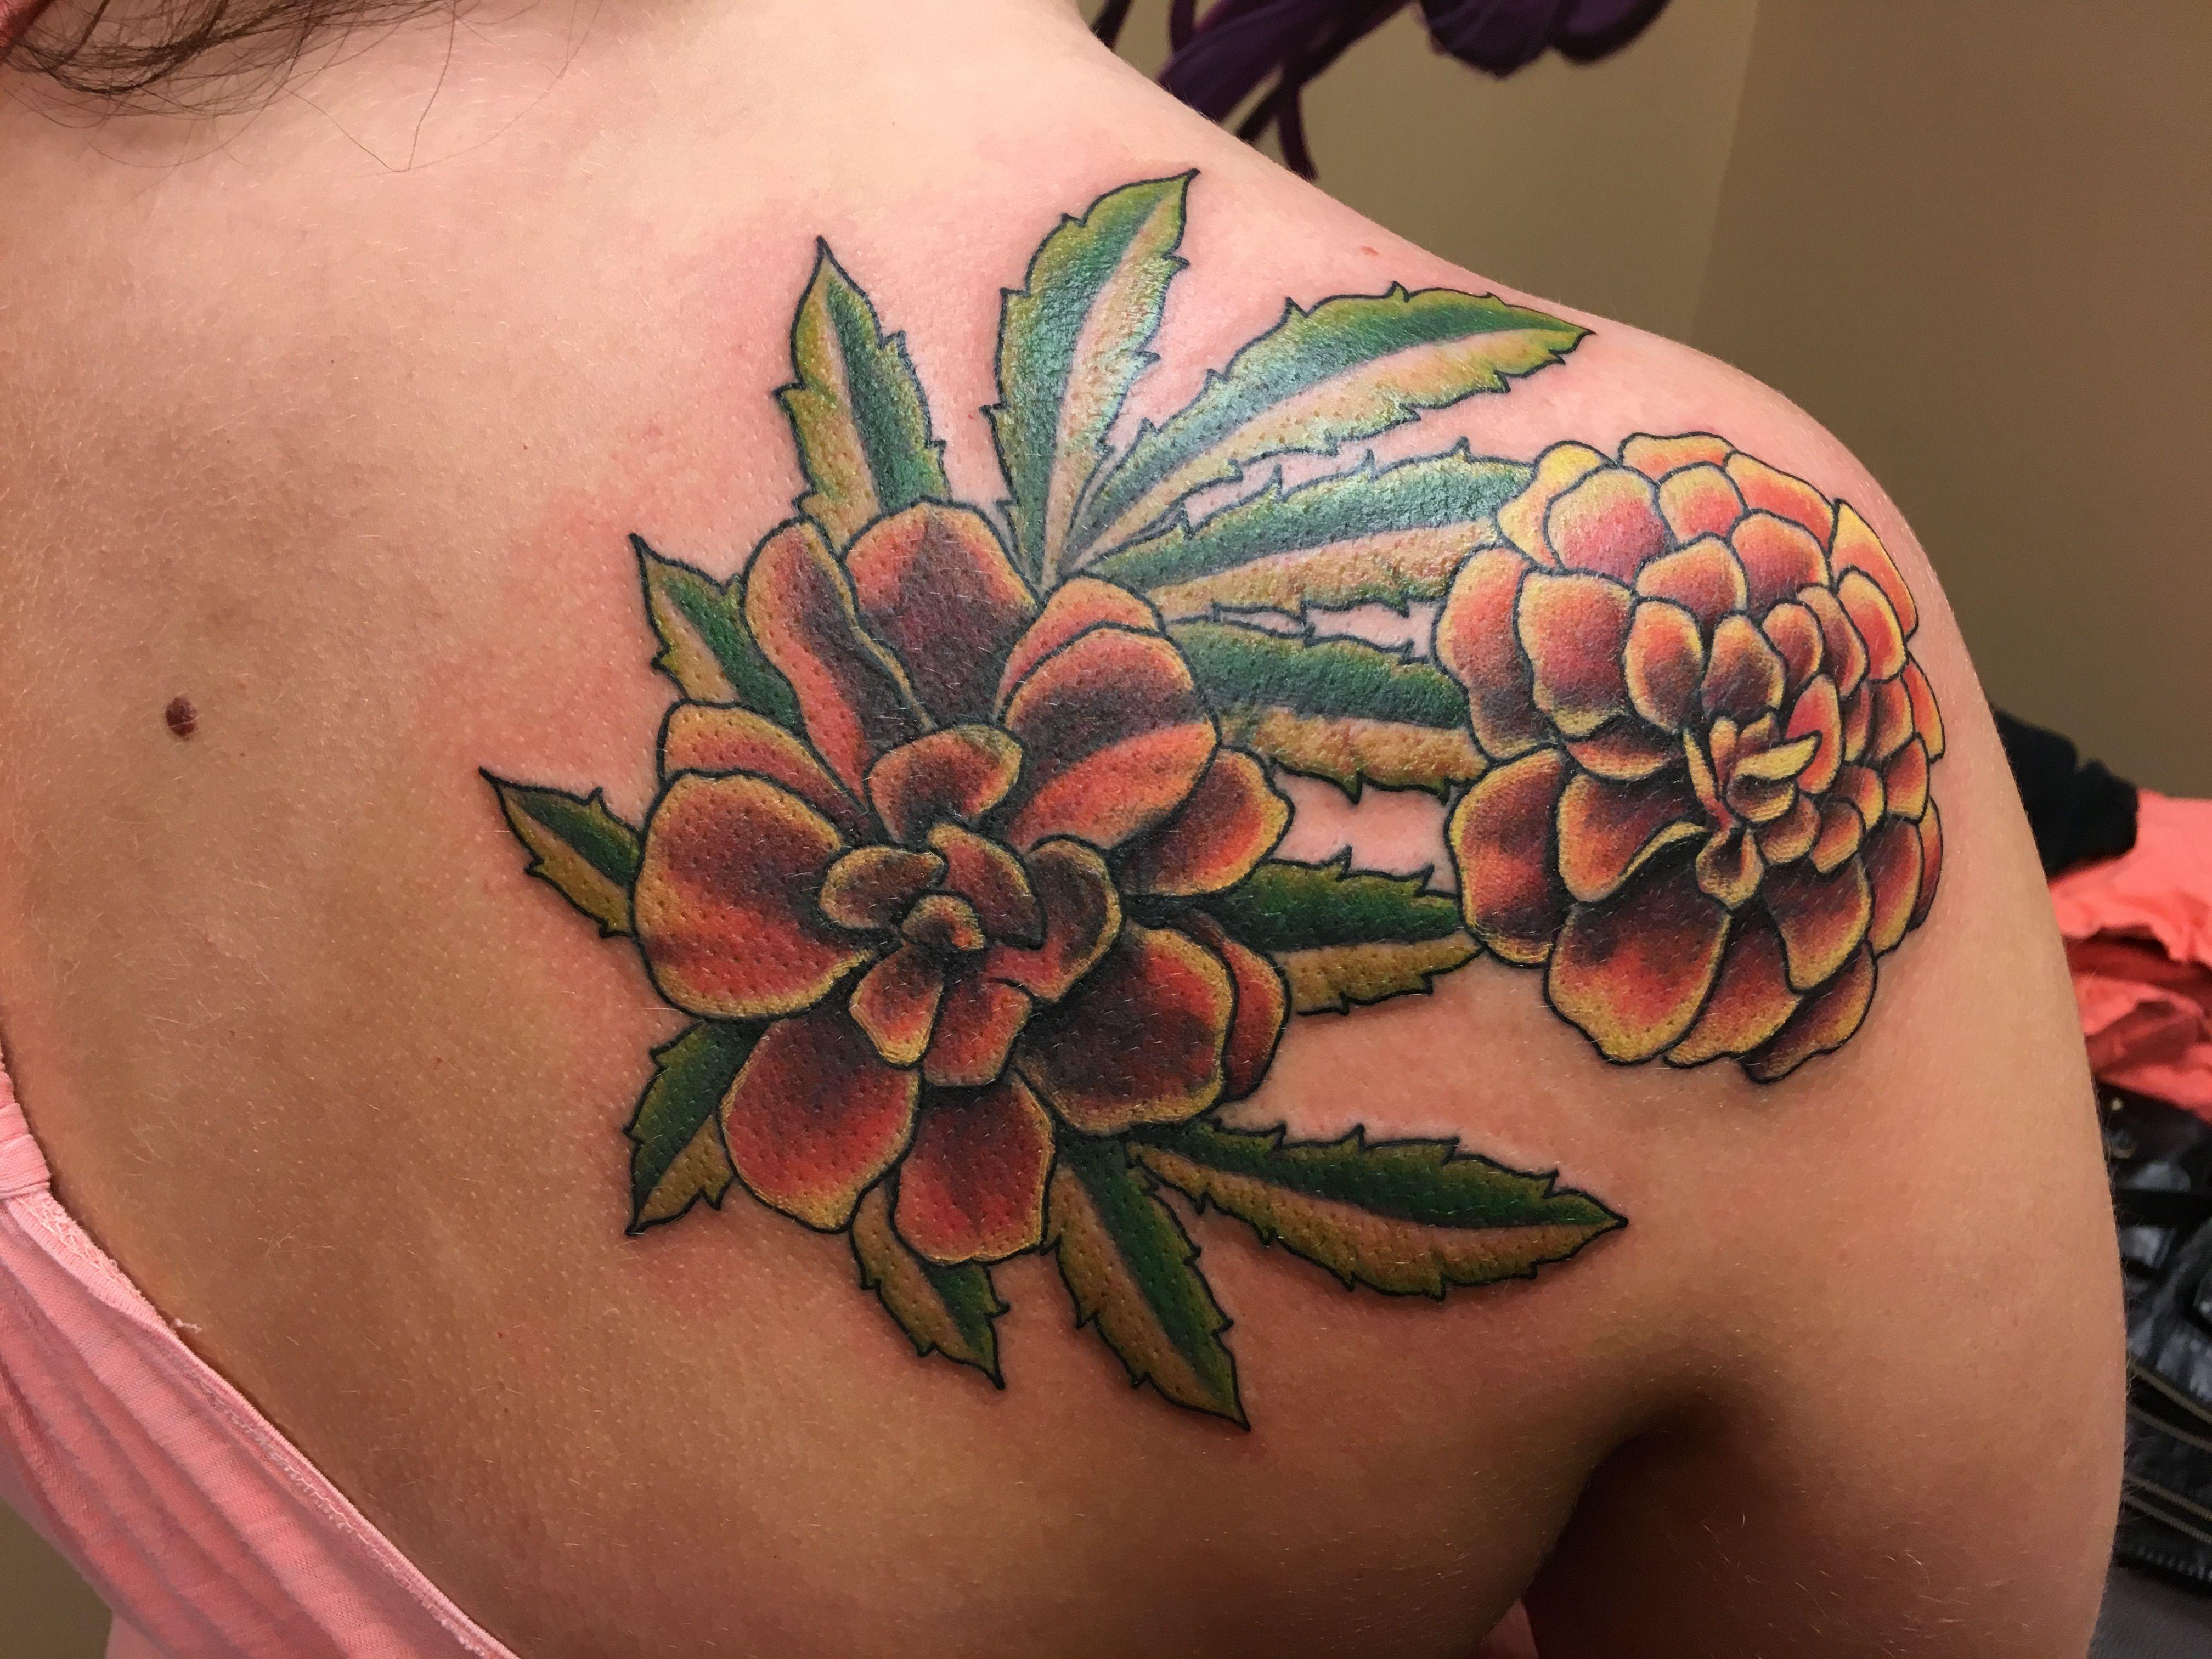 Marigold tattoo coverup